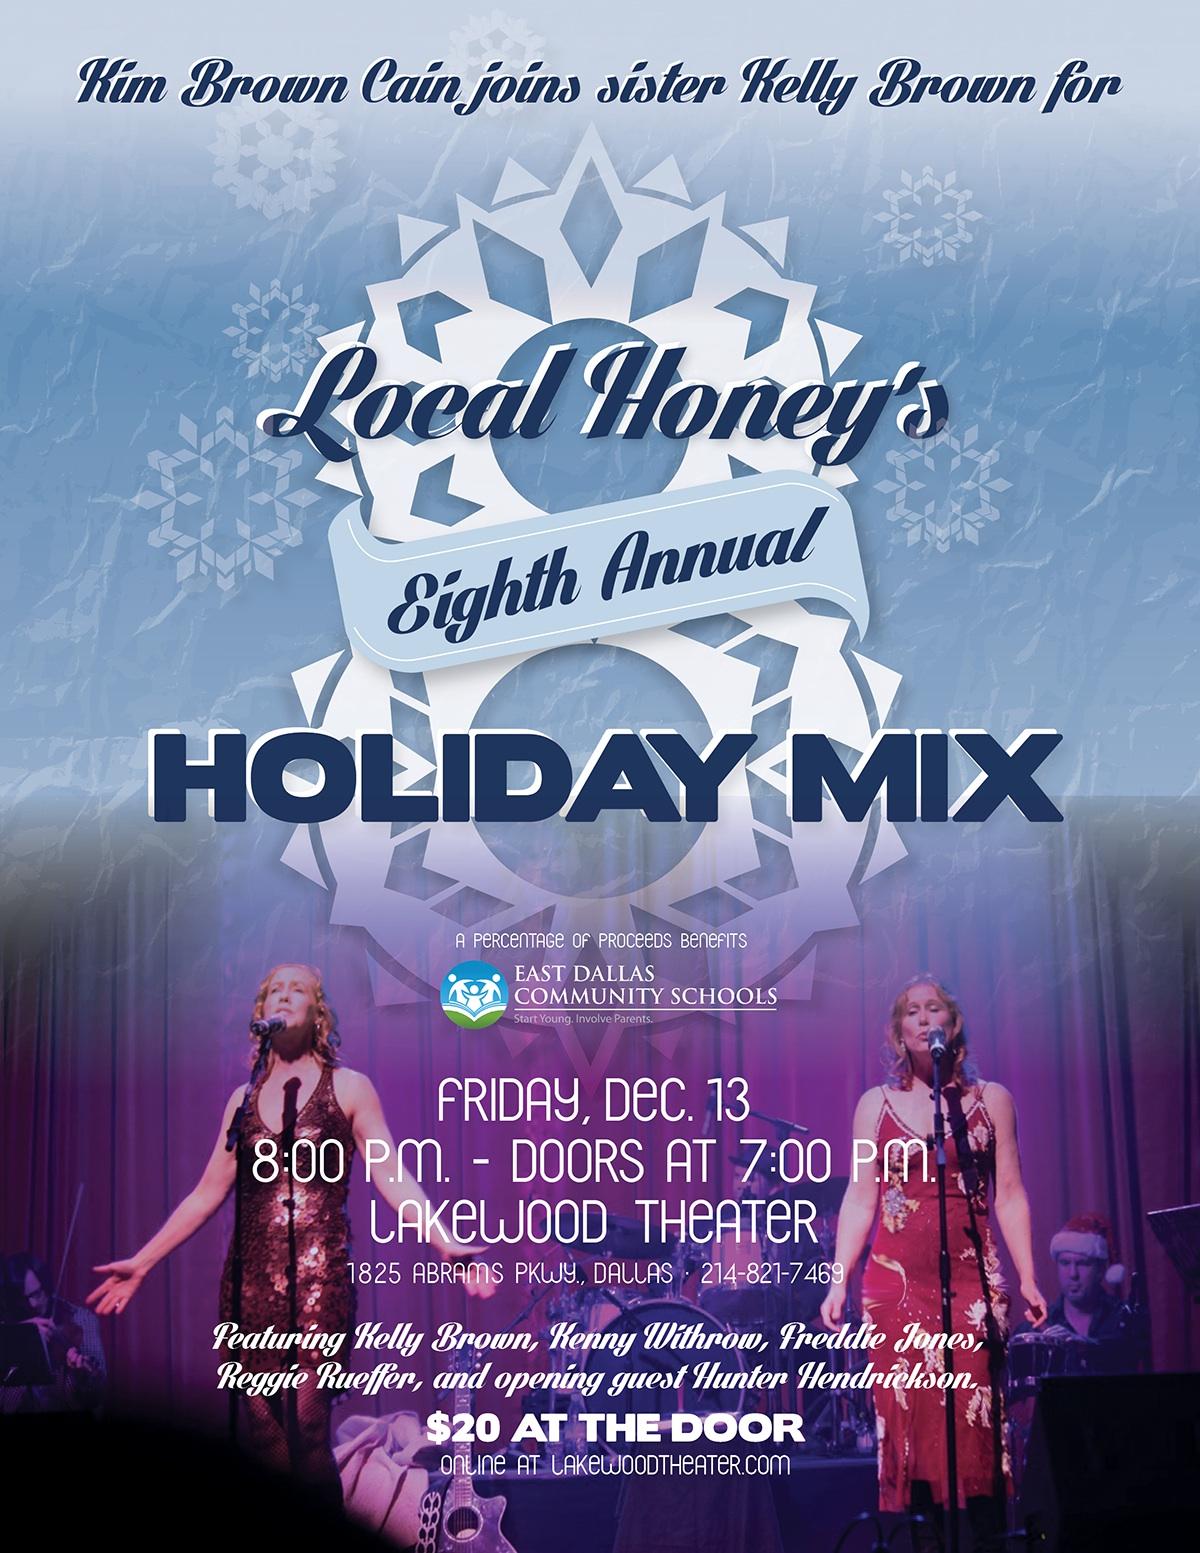 Local Honey Holiday Mix